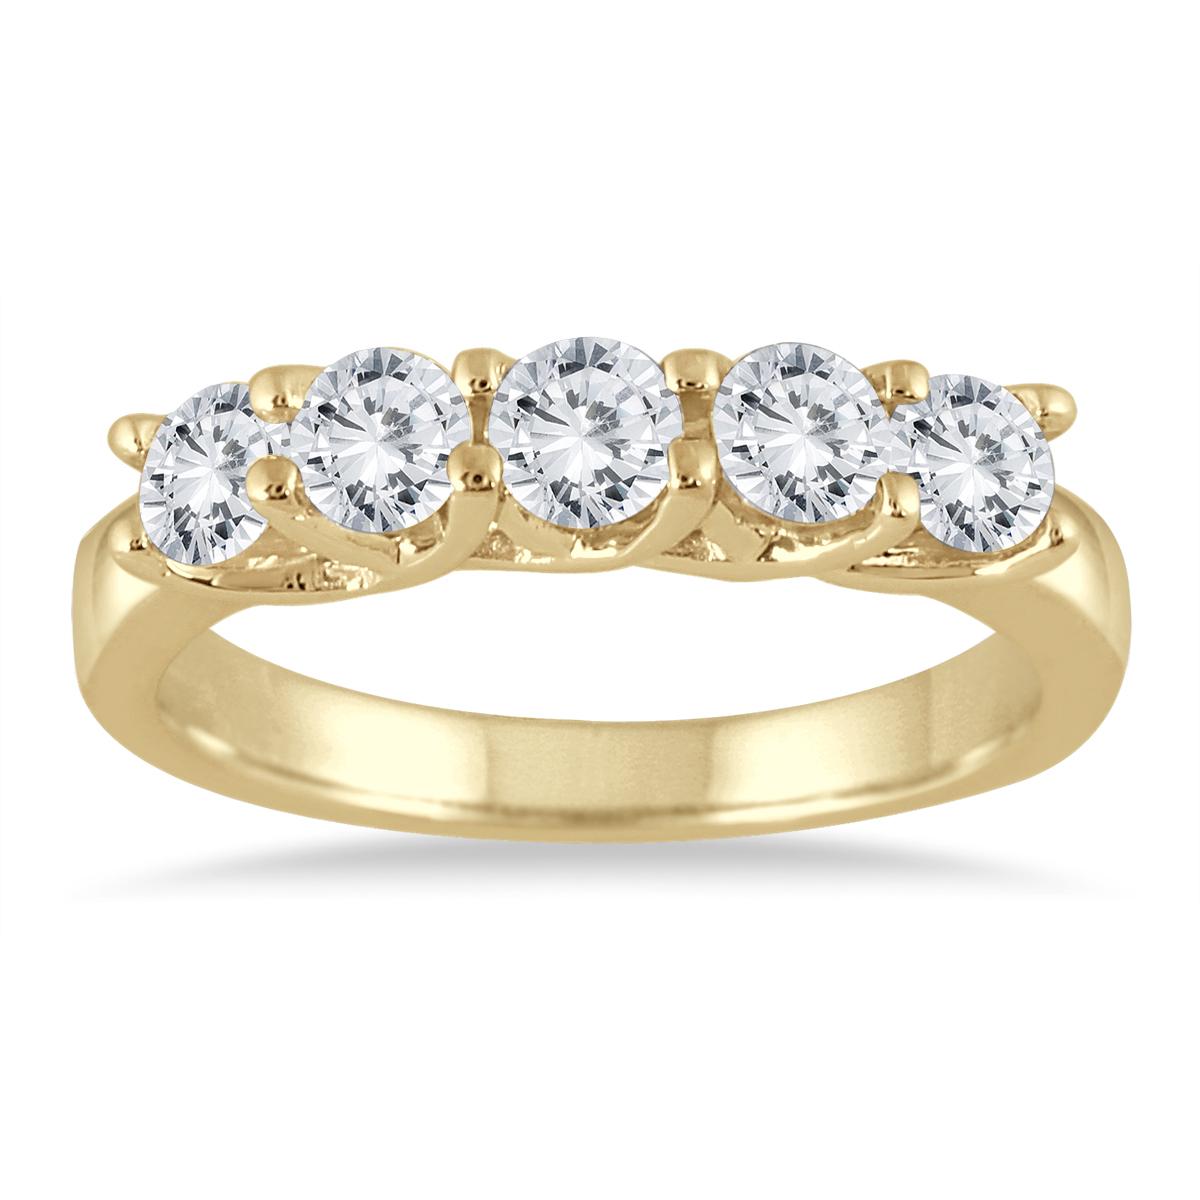 1 Carat TW Five Stone Diamond Wedding Band in 10K Yellow Gold